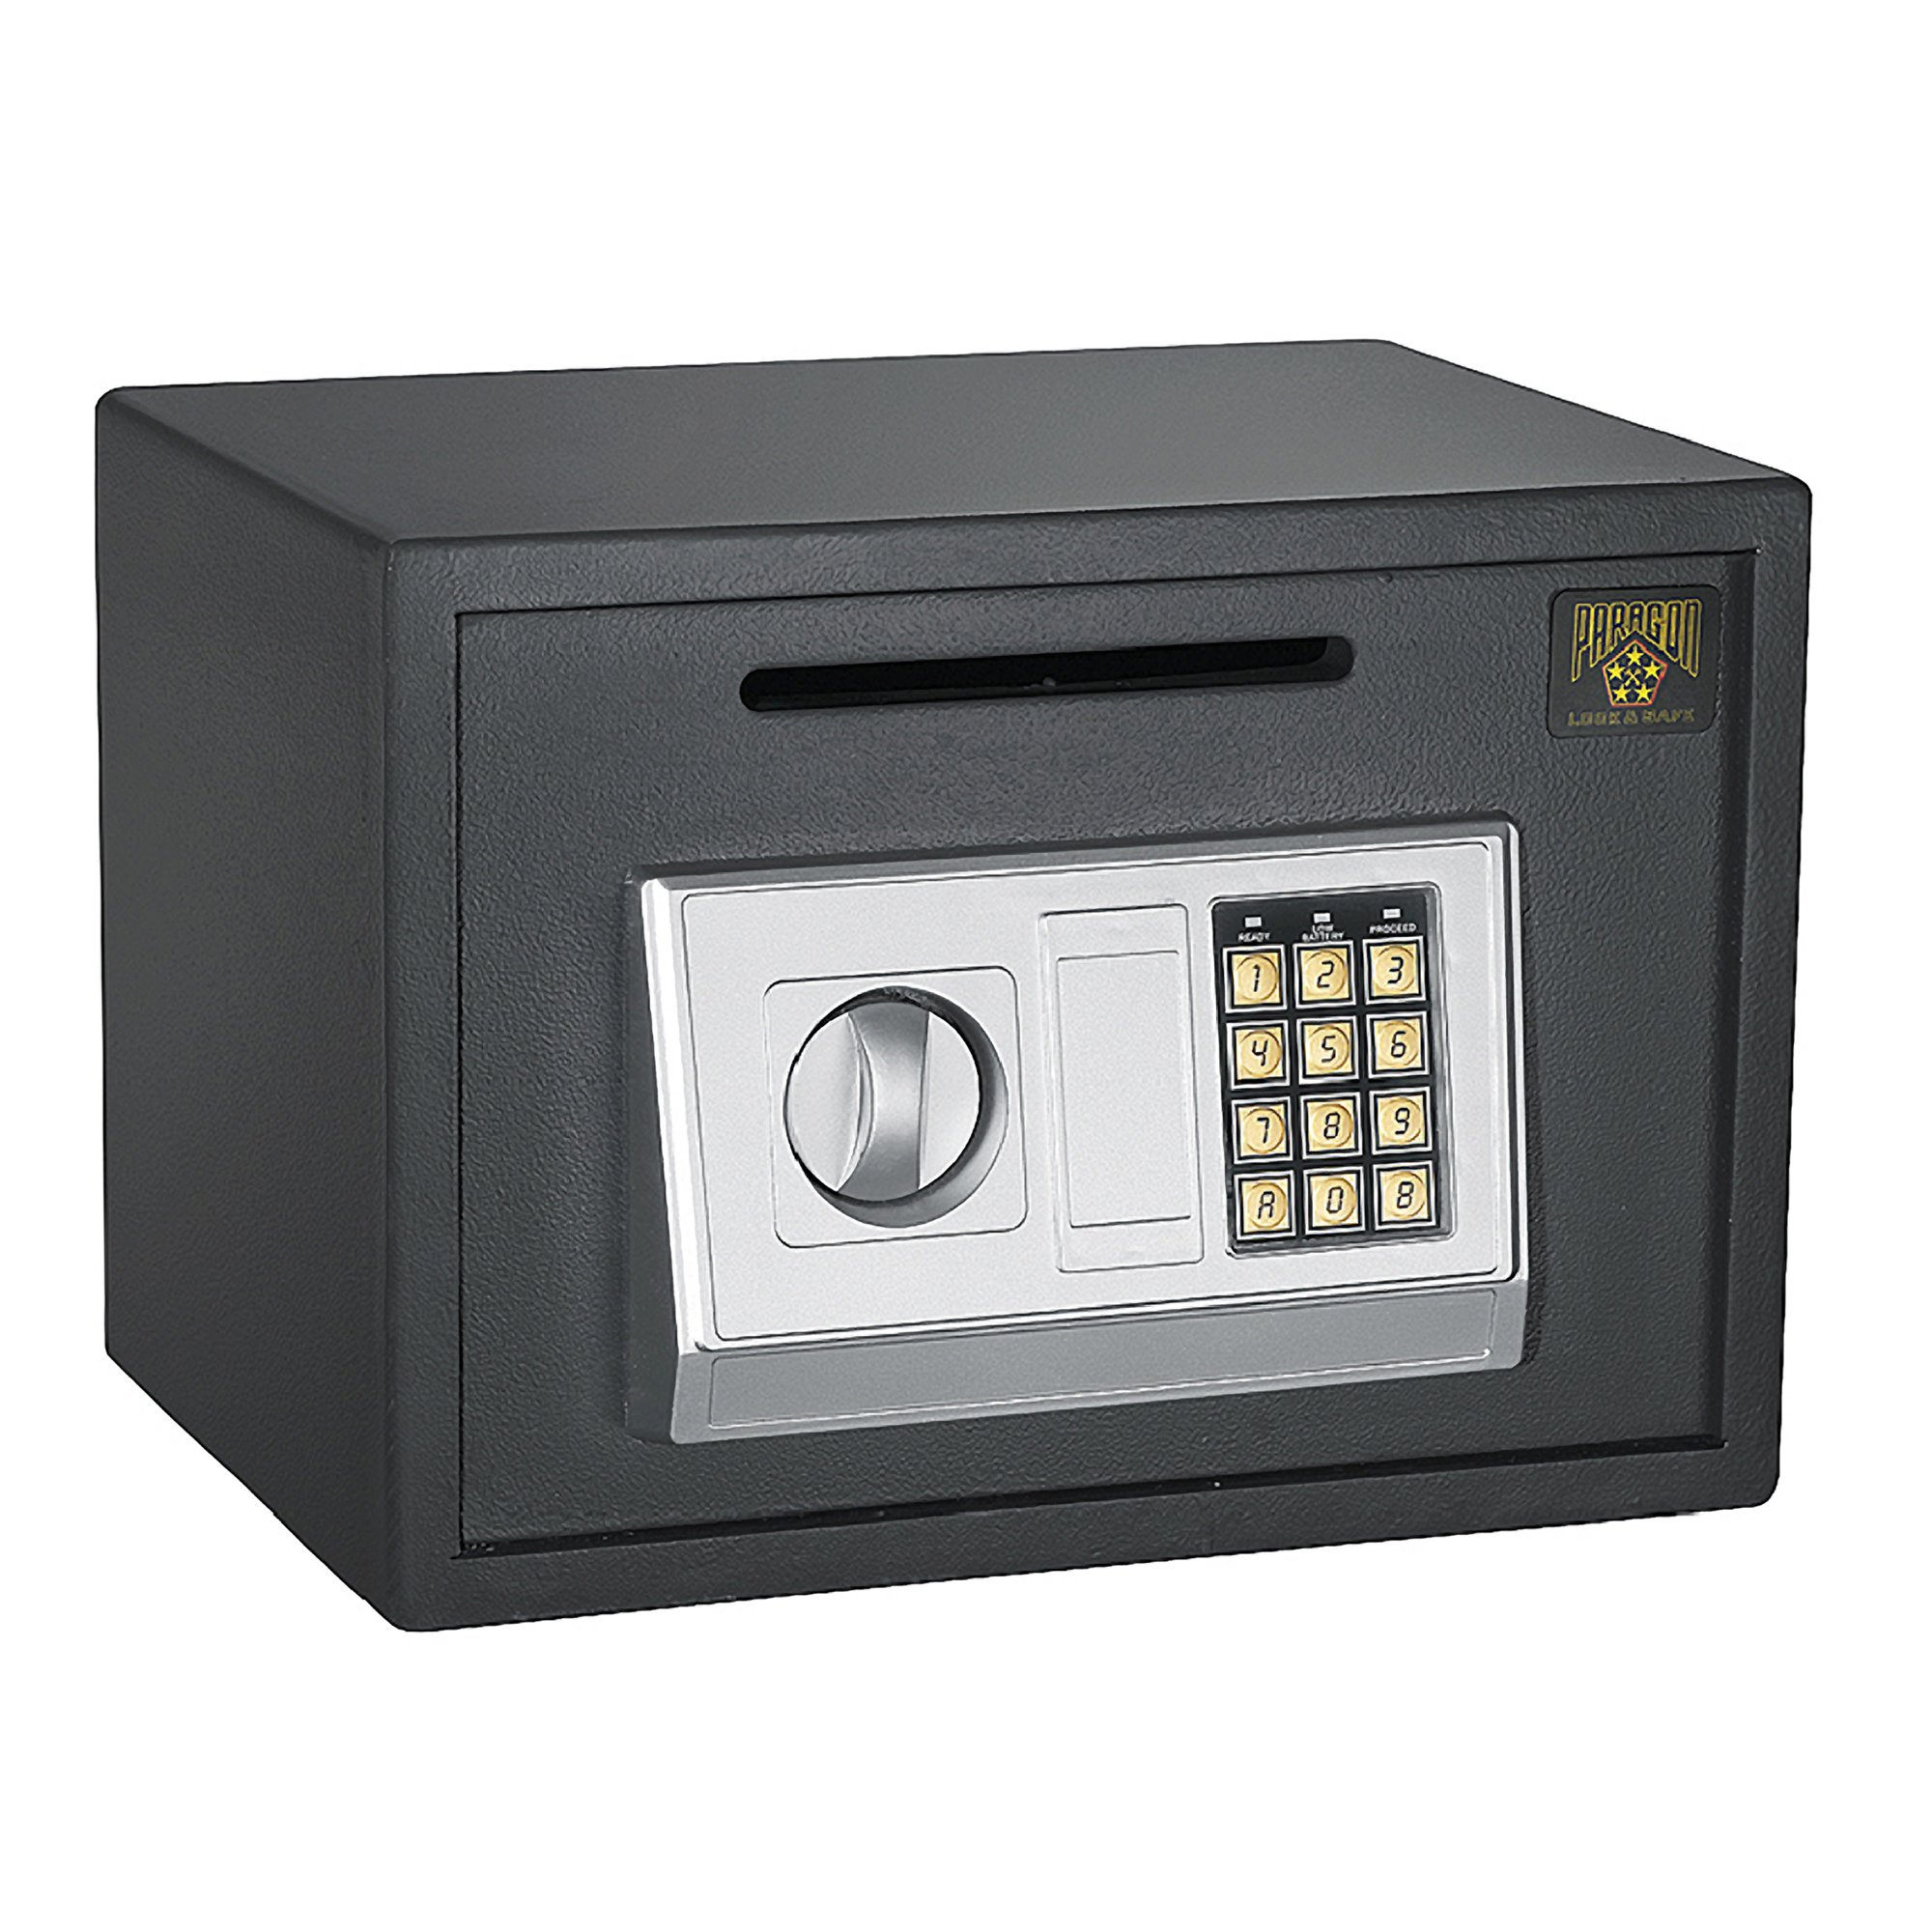 Paragon Lock and Safe 7875 Digital Depository Safe .67 CF Cash Drop Safes Heavy Duty Secure